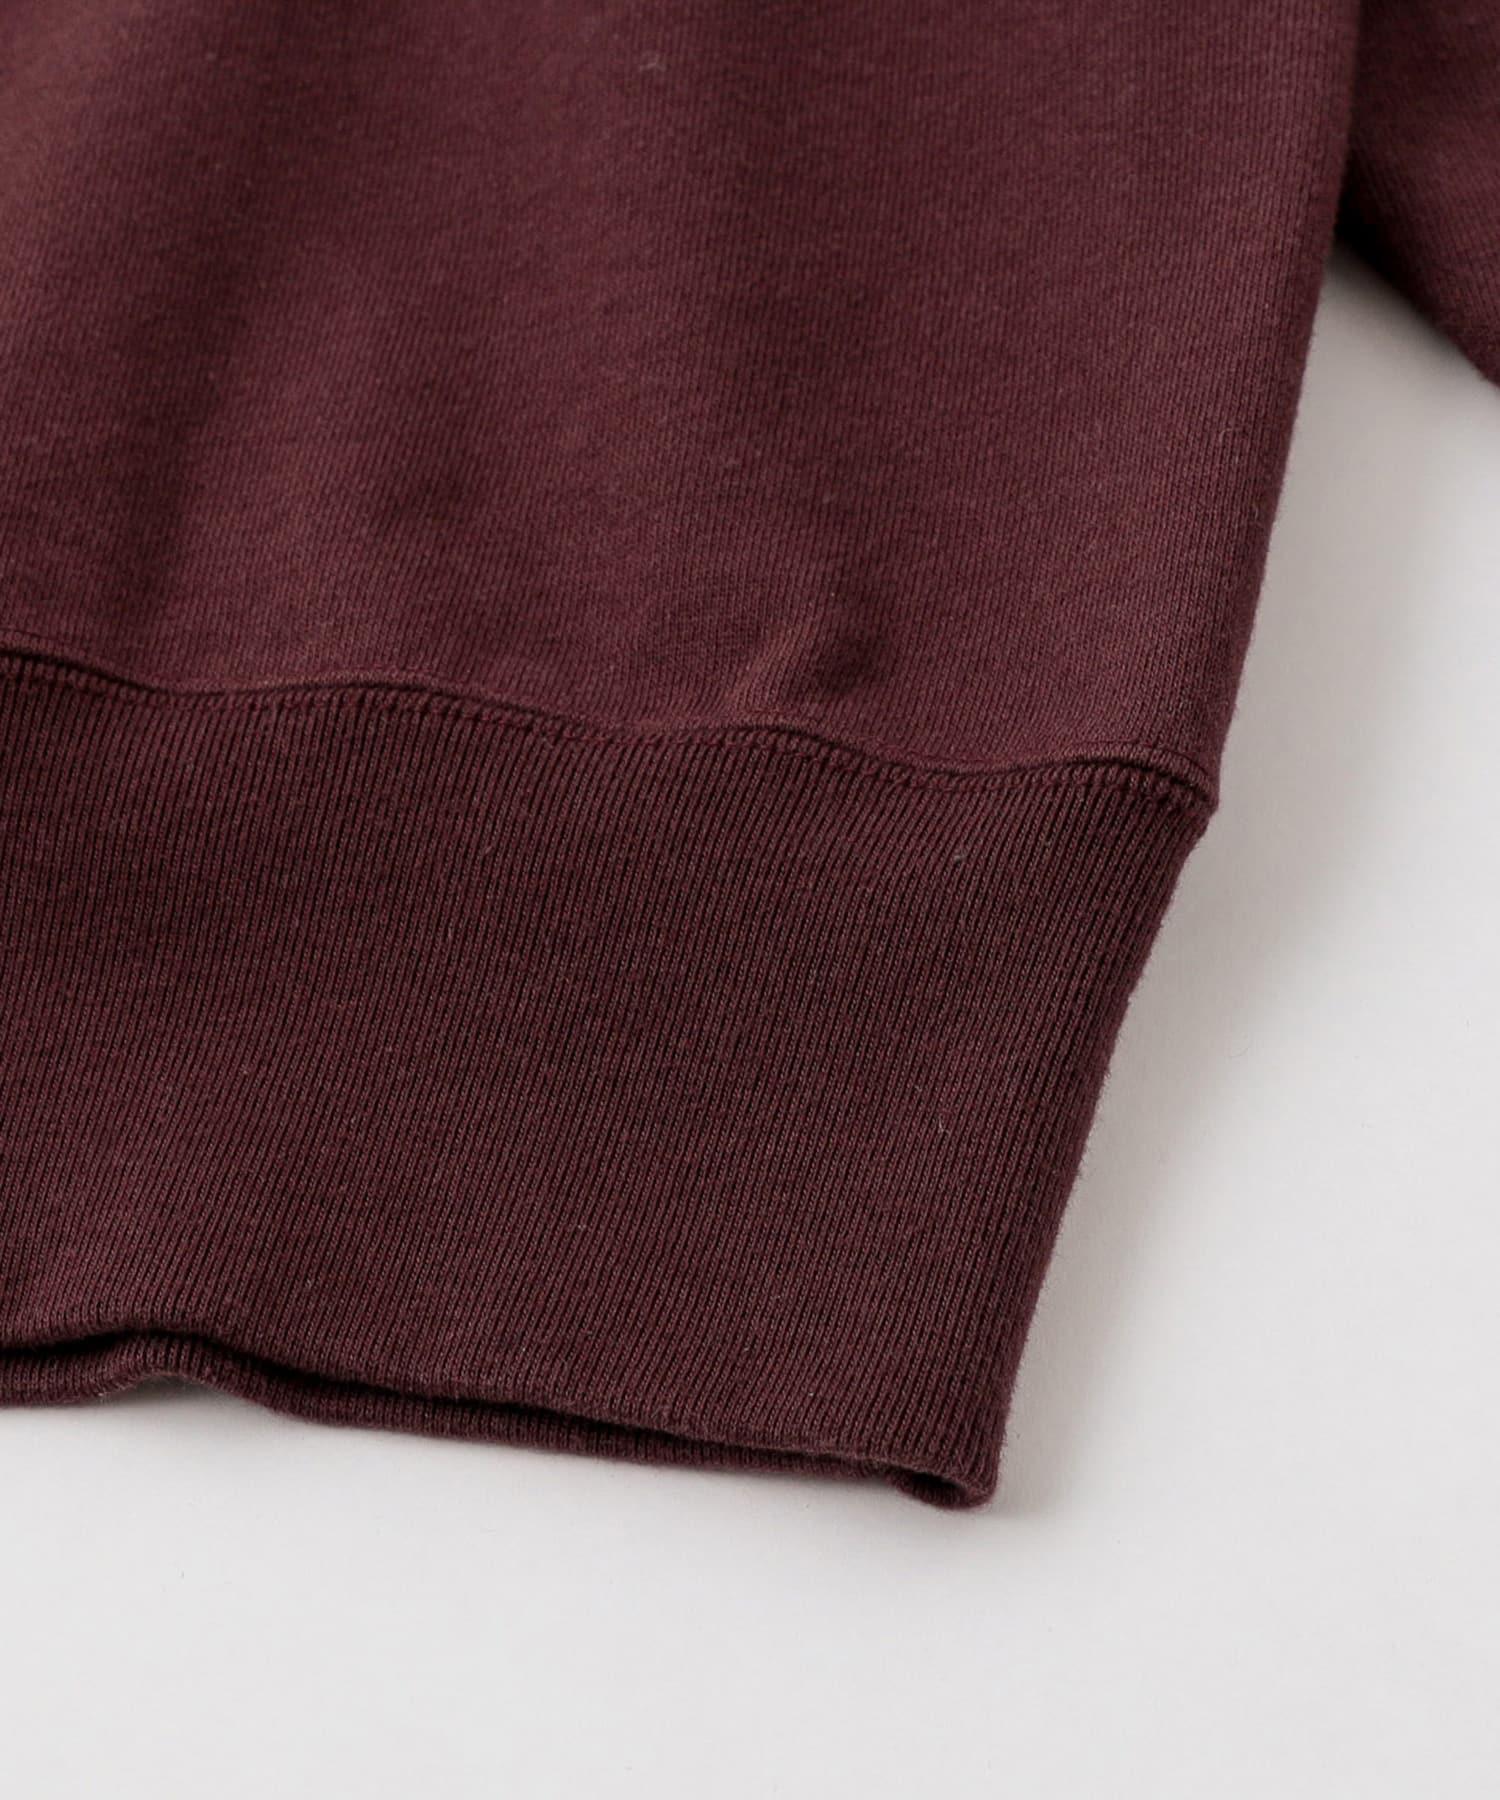 BLOOM&BRANCH(ブルームアンドブランチ) PHLANNÈL SOL / womens Suvin Cotton Sweat